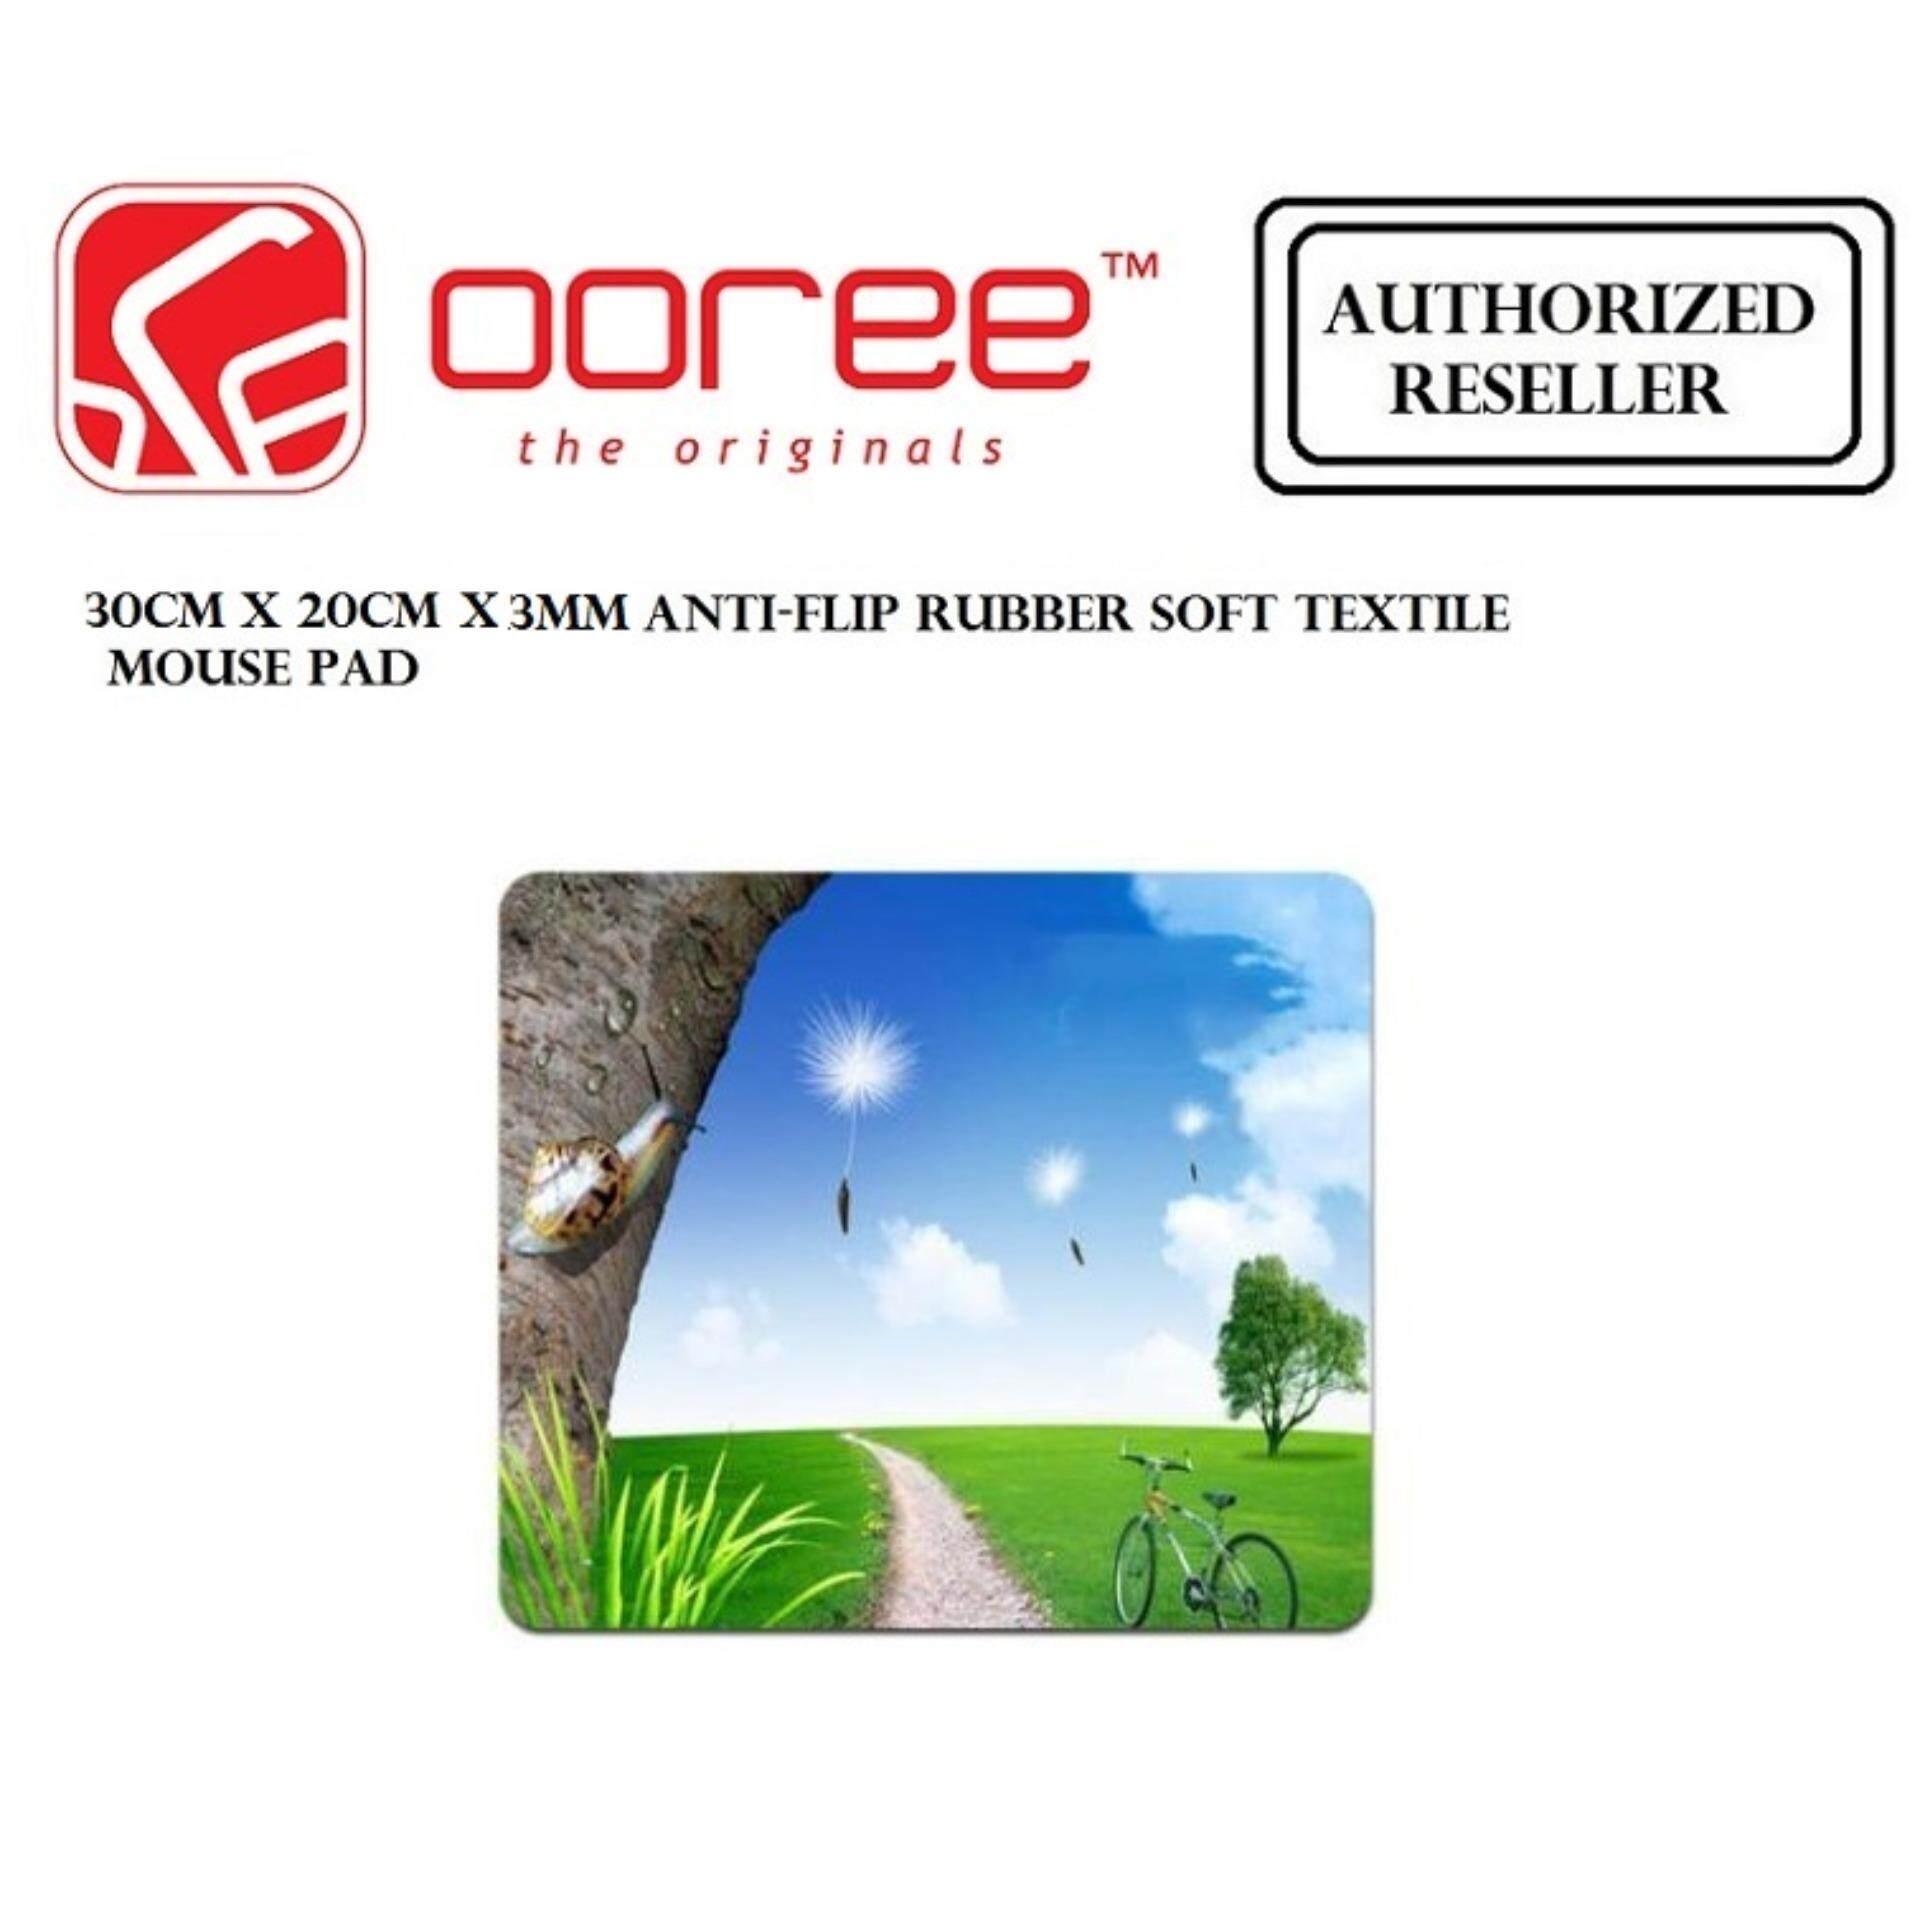 Sell Mouse Pad Large Cheapest Best Quality My Store Razer Mantis Normal Edge Gaming Mat Myr 9 Premium Anti Slip Medium